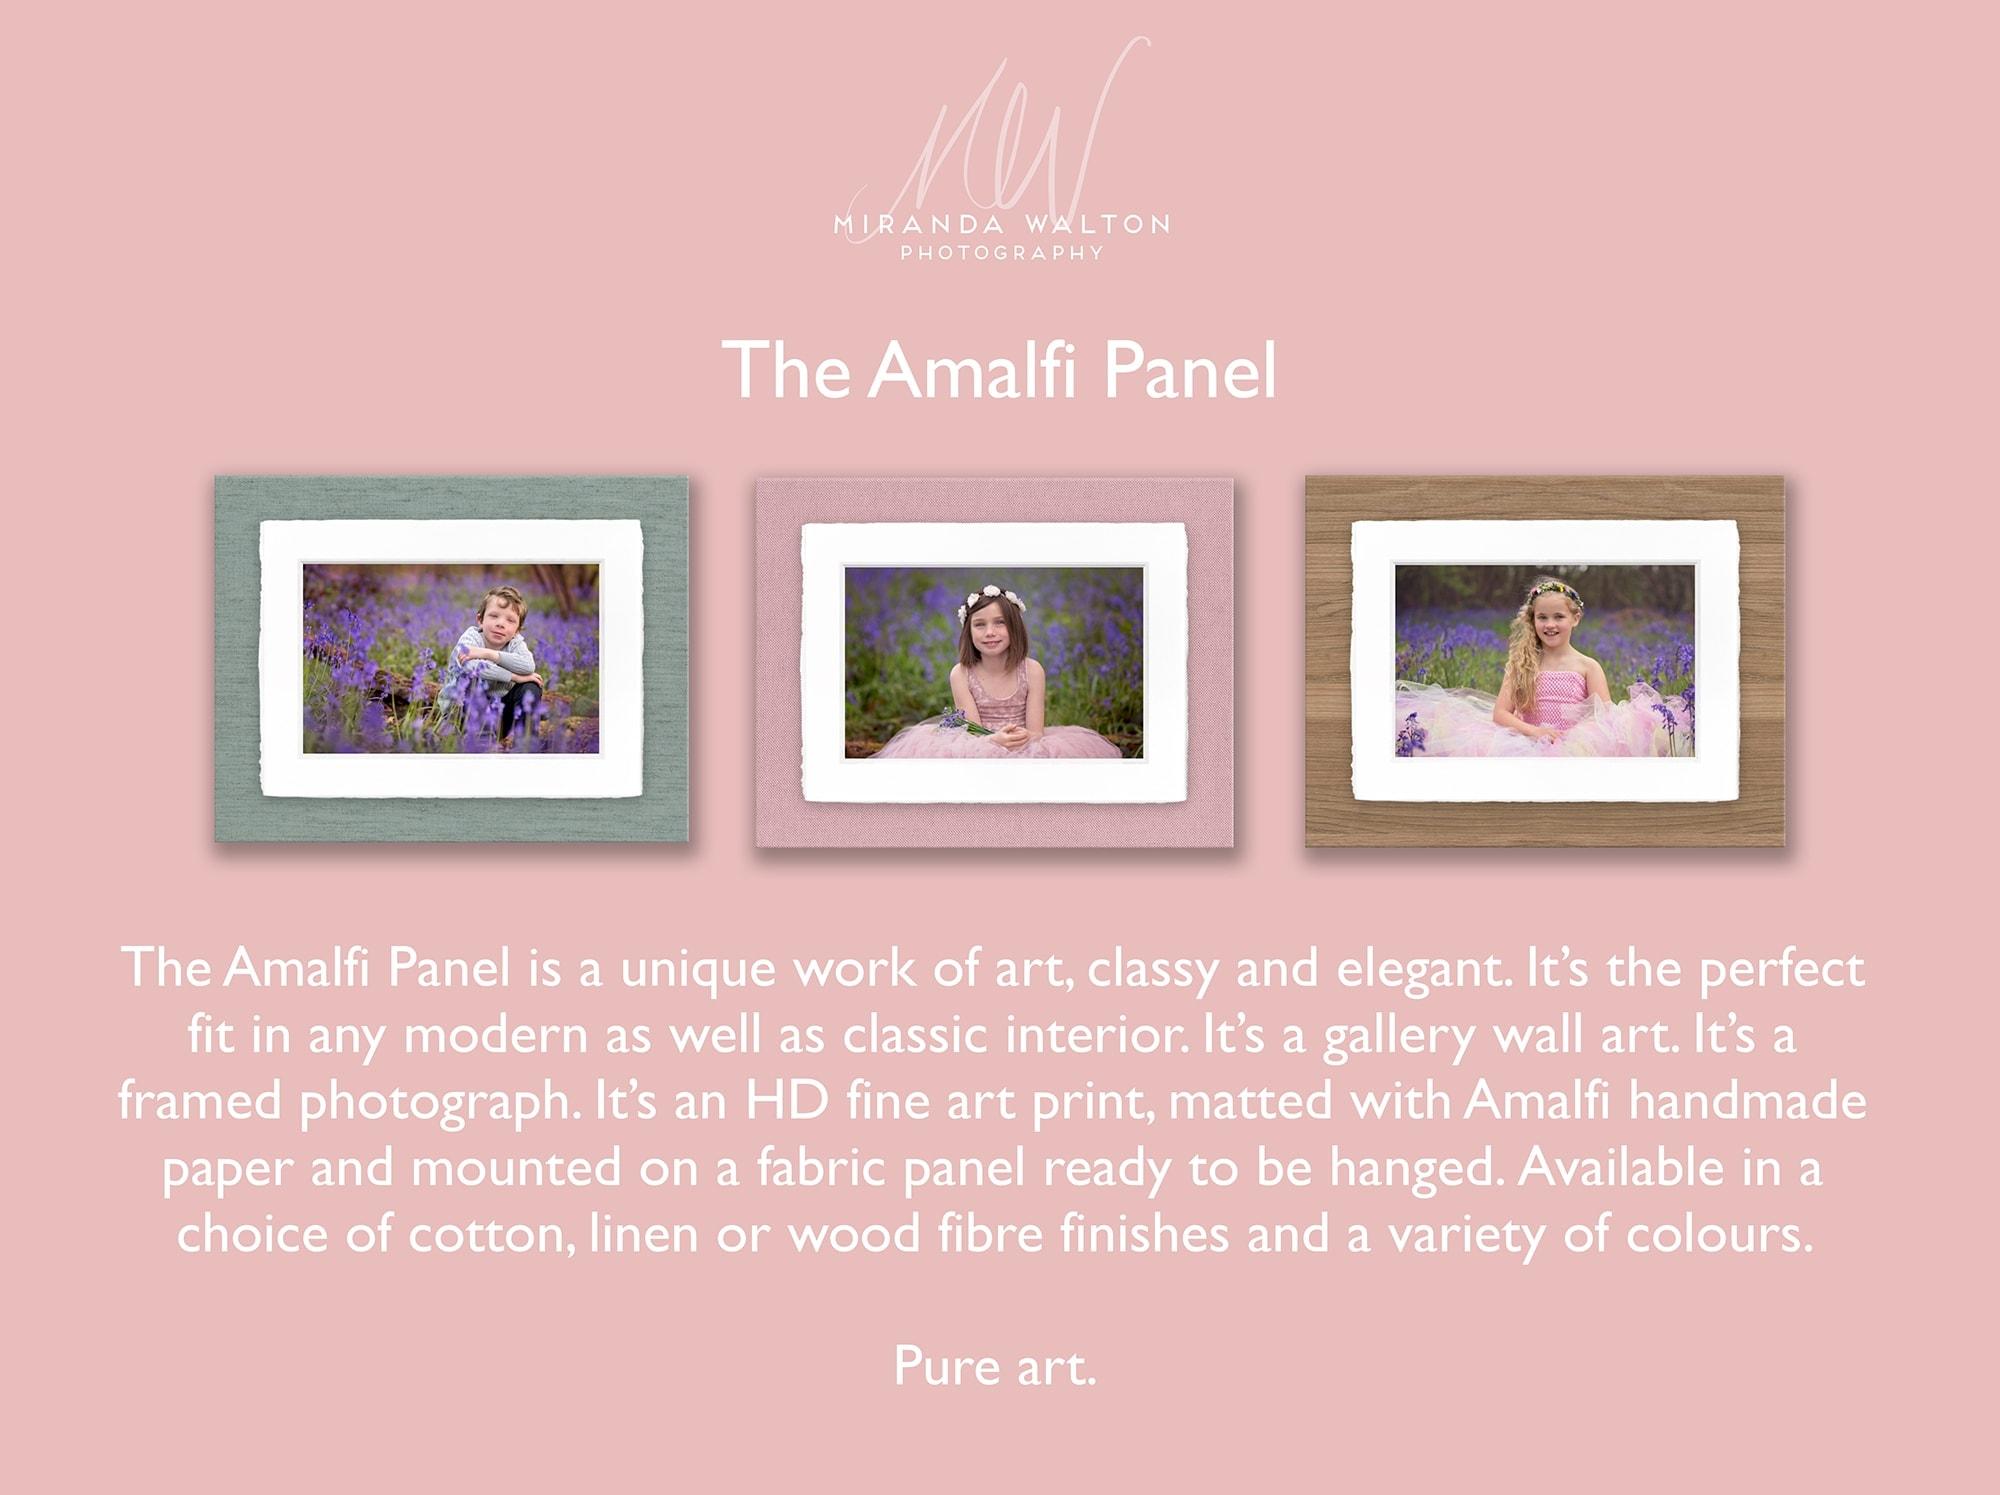 Amalfi-panel-bluebell-photography